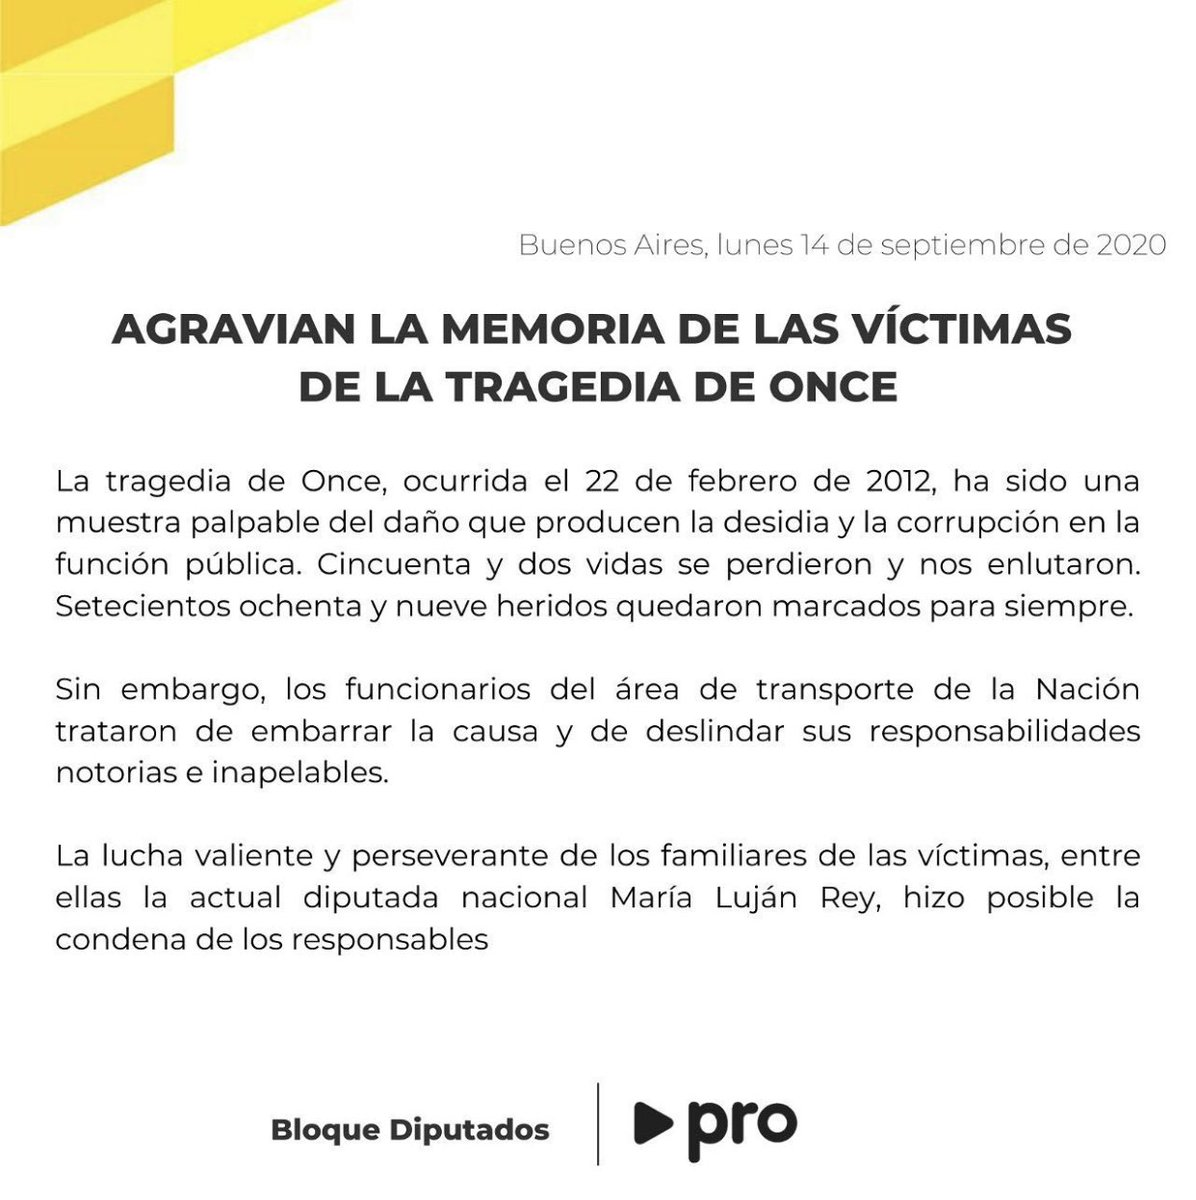 Agravian la memoria de las víctimas de la #TragediaDeOnce   @MariaLujan_Rey https://t.co/WmrdwP2hfc